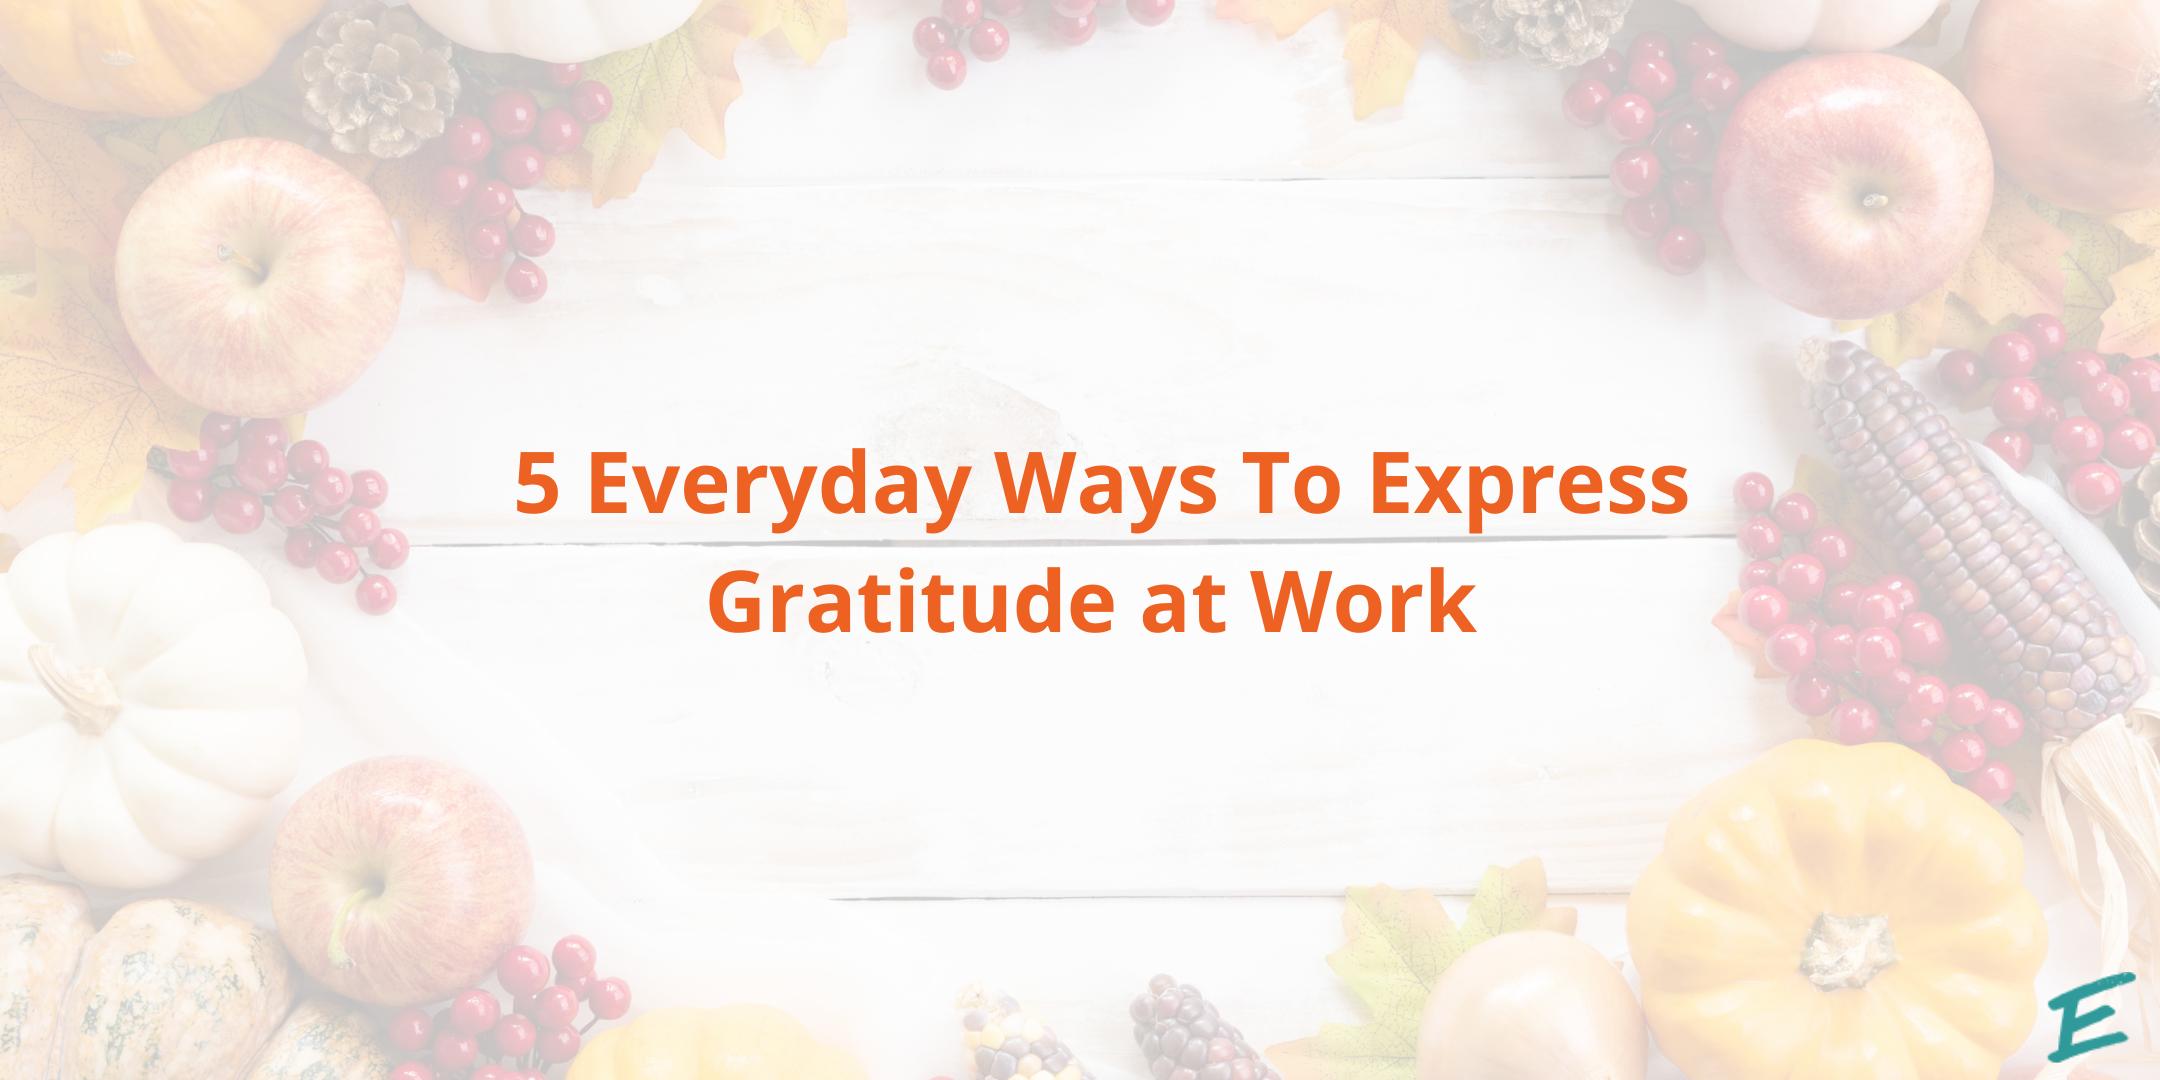 everyday-ways-express-gratitude-at-work